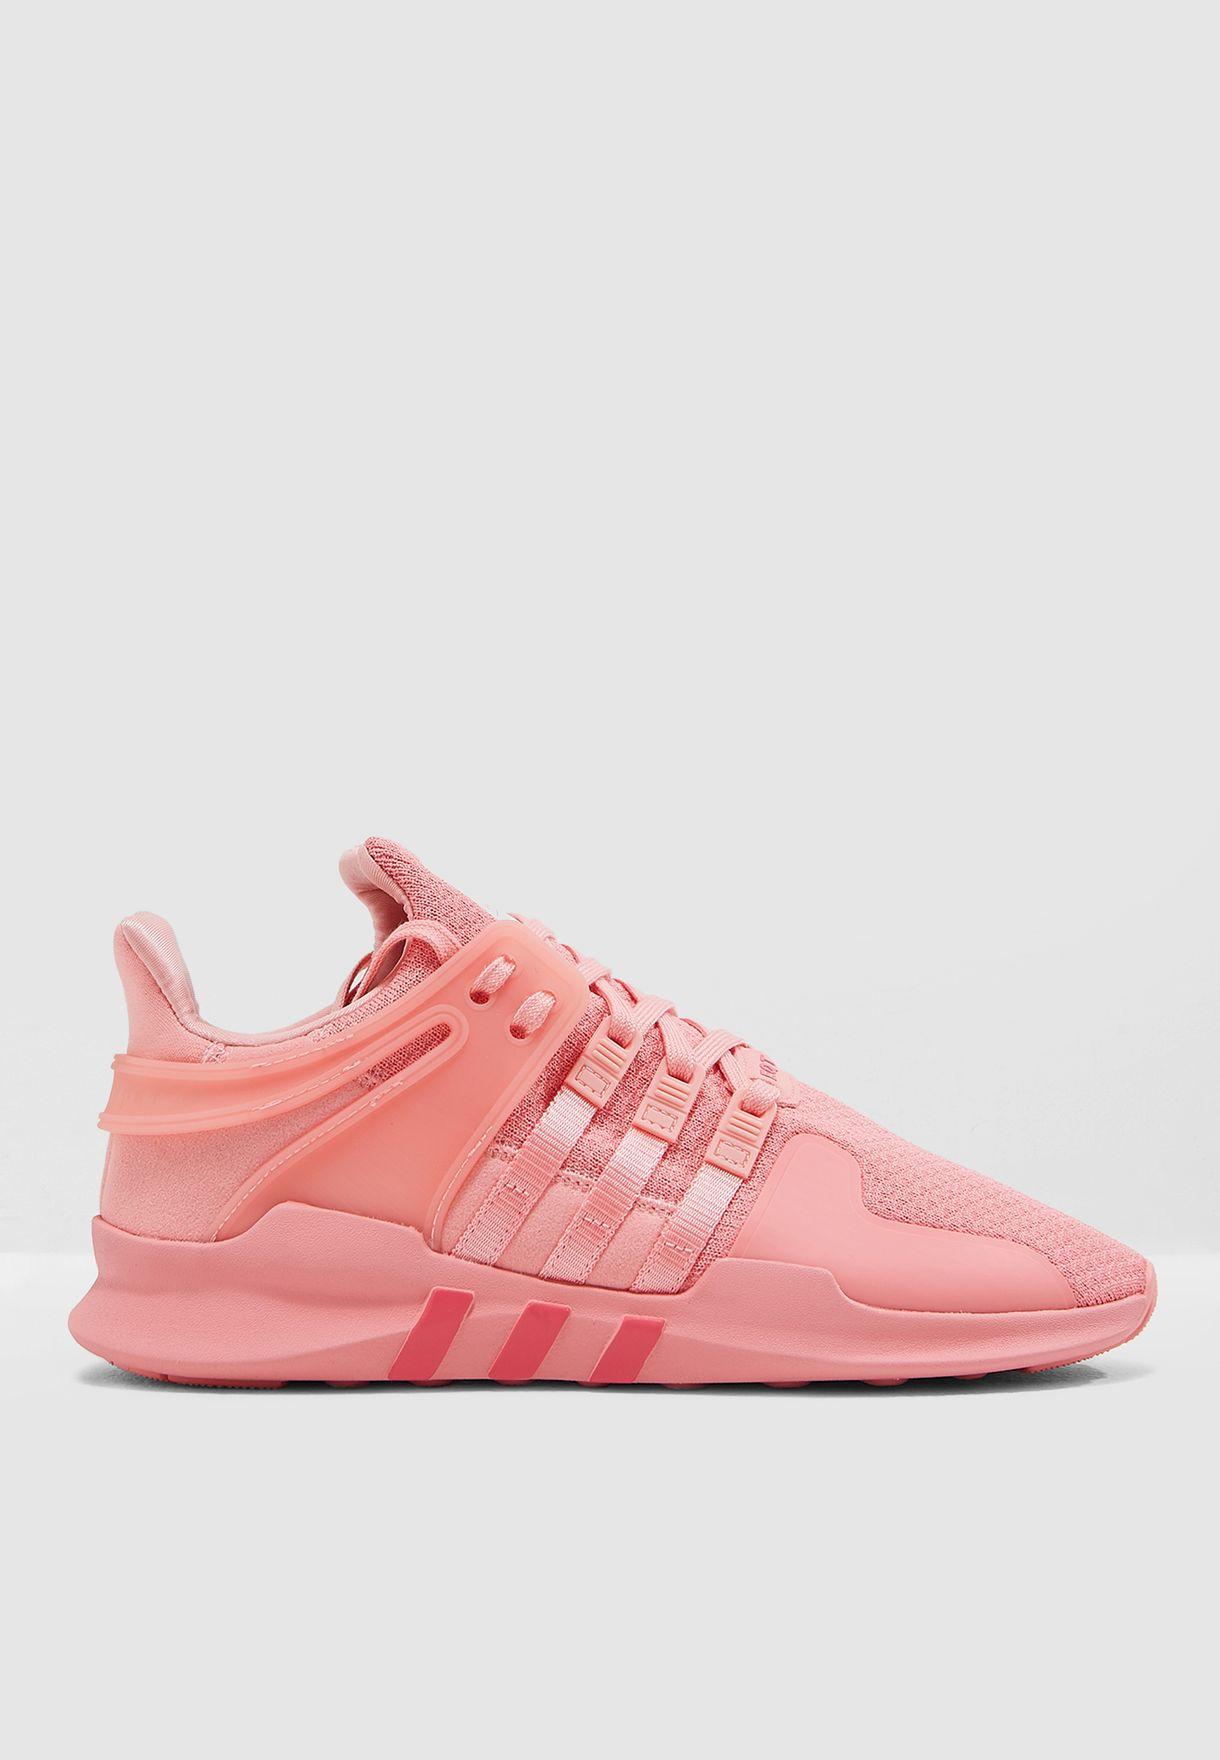 af22c62732cee Shop adidas Originals pink EQT Support ADV B37541 for Women in UAE ...